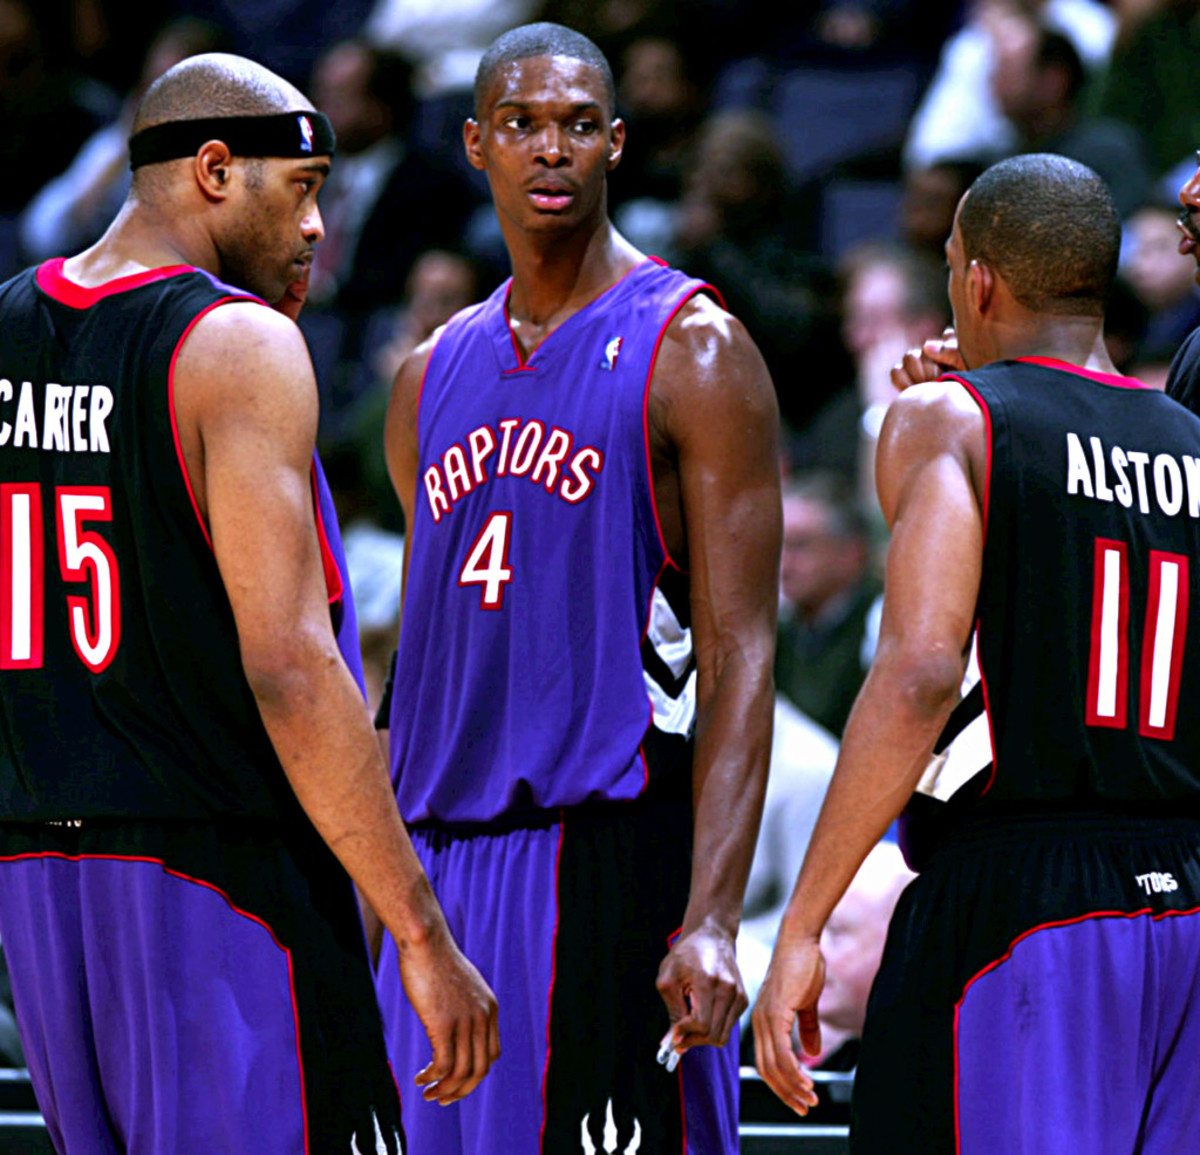 Chris Bosh and Vince Carter in Raptors jersey